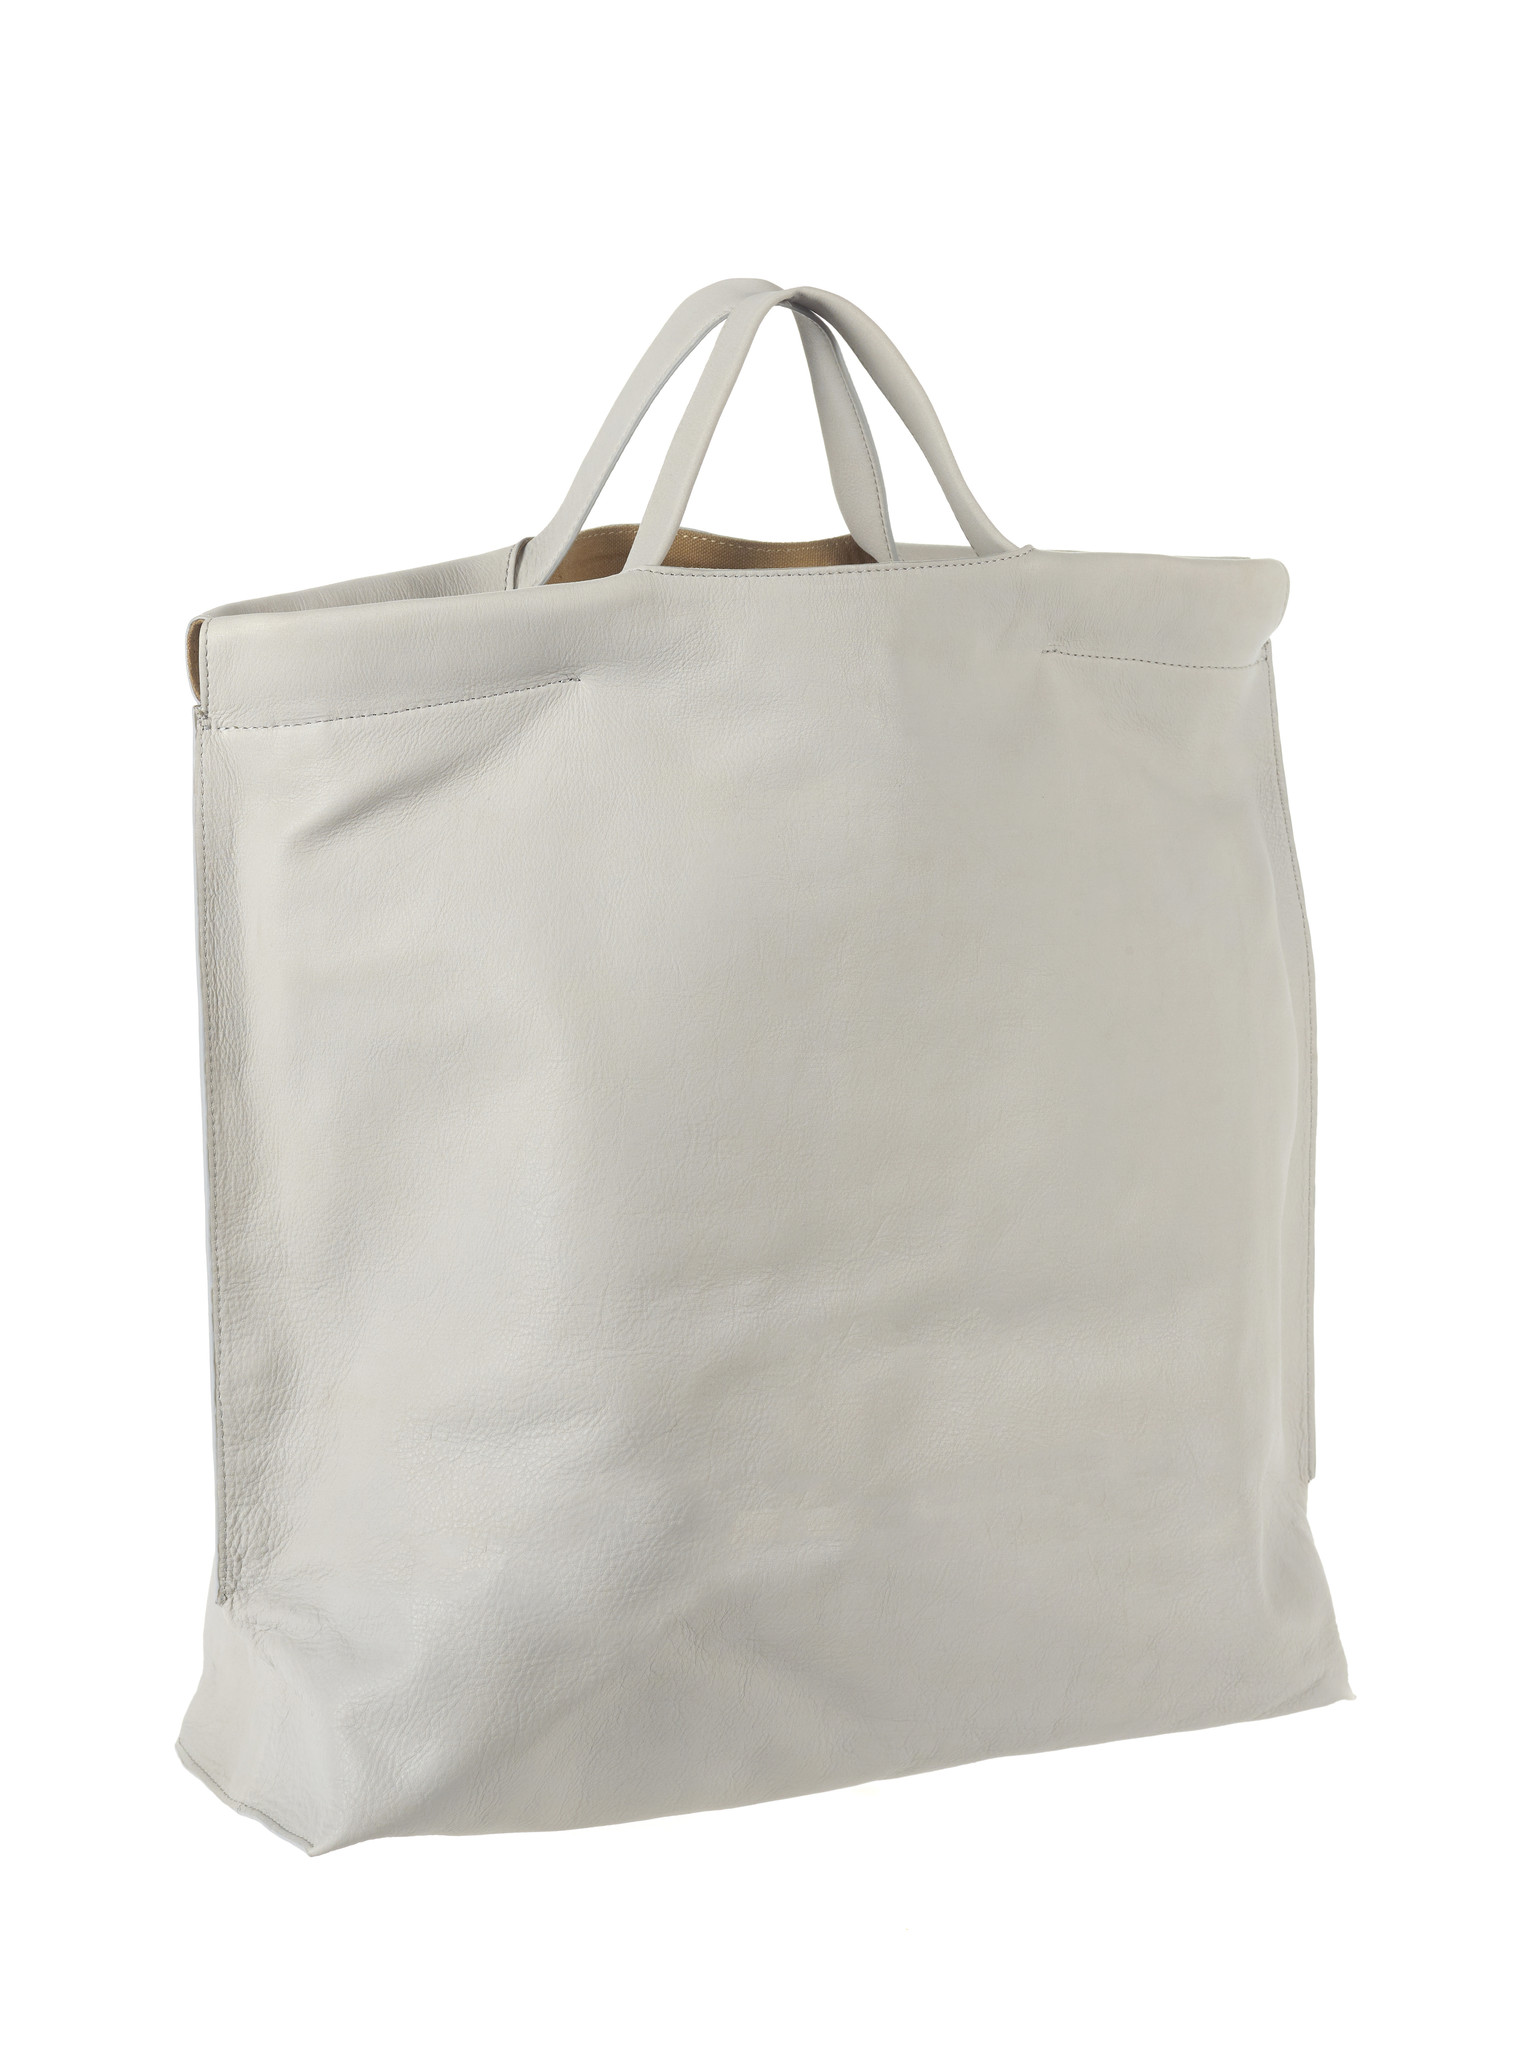 Shopper light grey